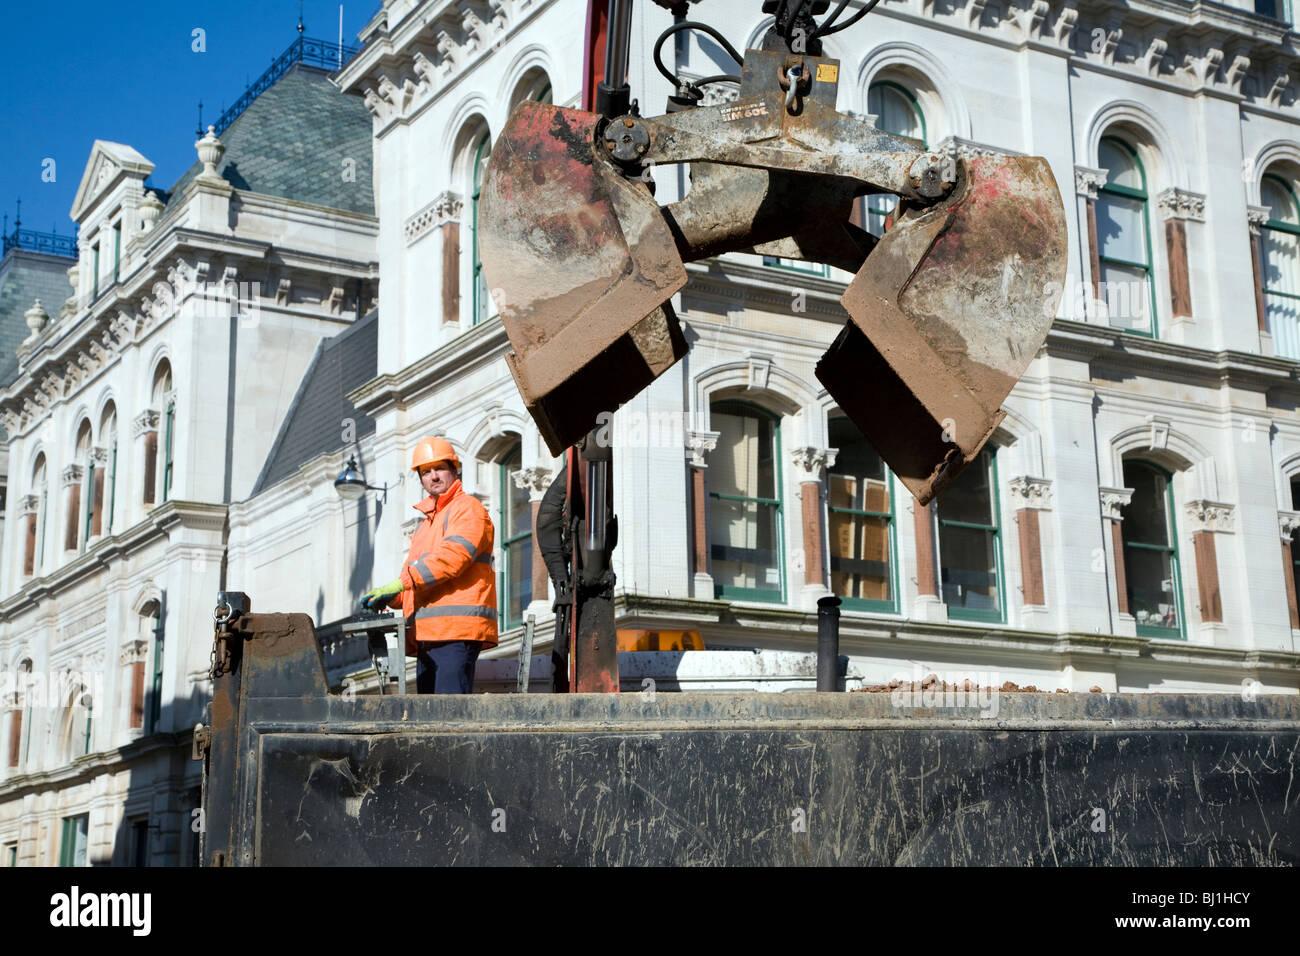 Man operating hydraulic grab machine on lorry - Stock Image